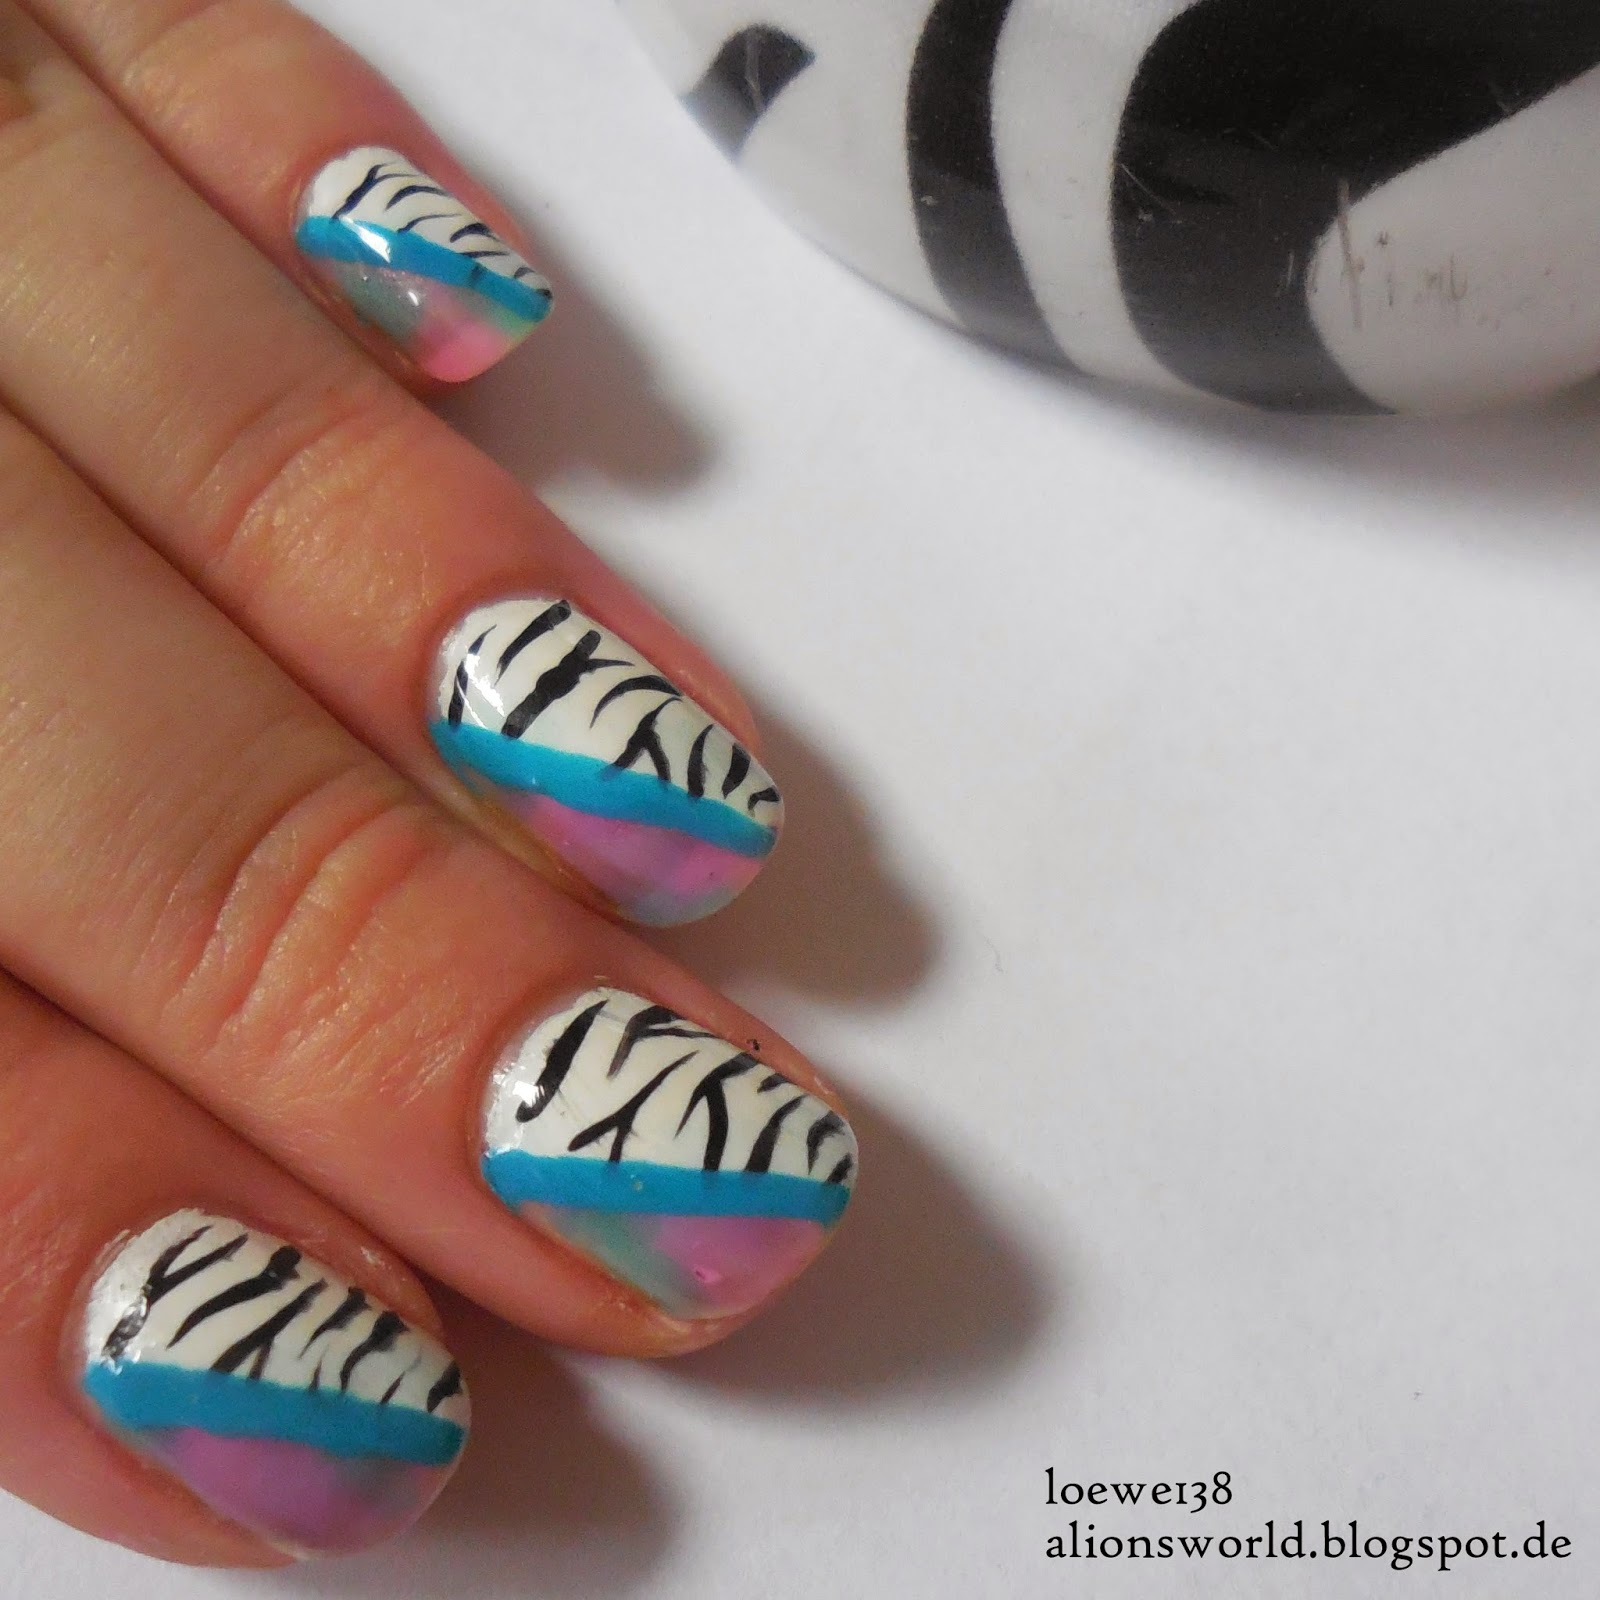 http://alionsworld.blogspot.com/2014/12/zebra-tritt-pastell-colourfulnailartsch.html